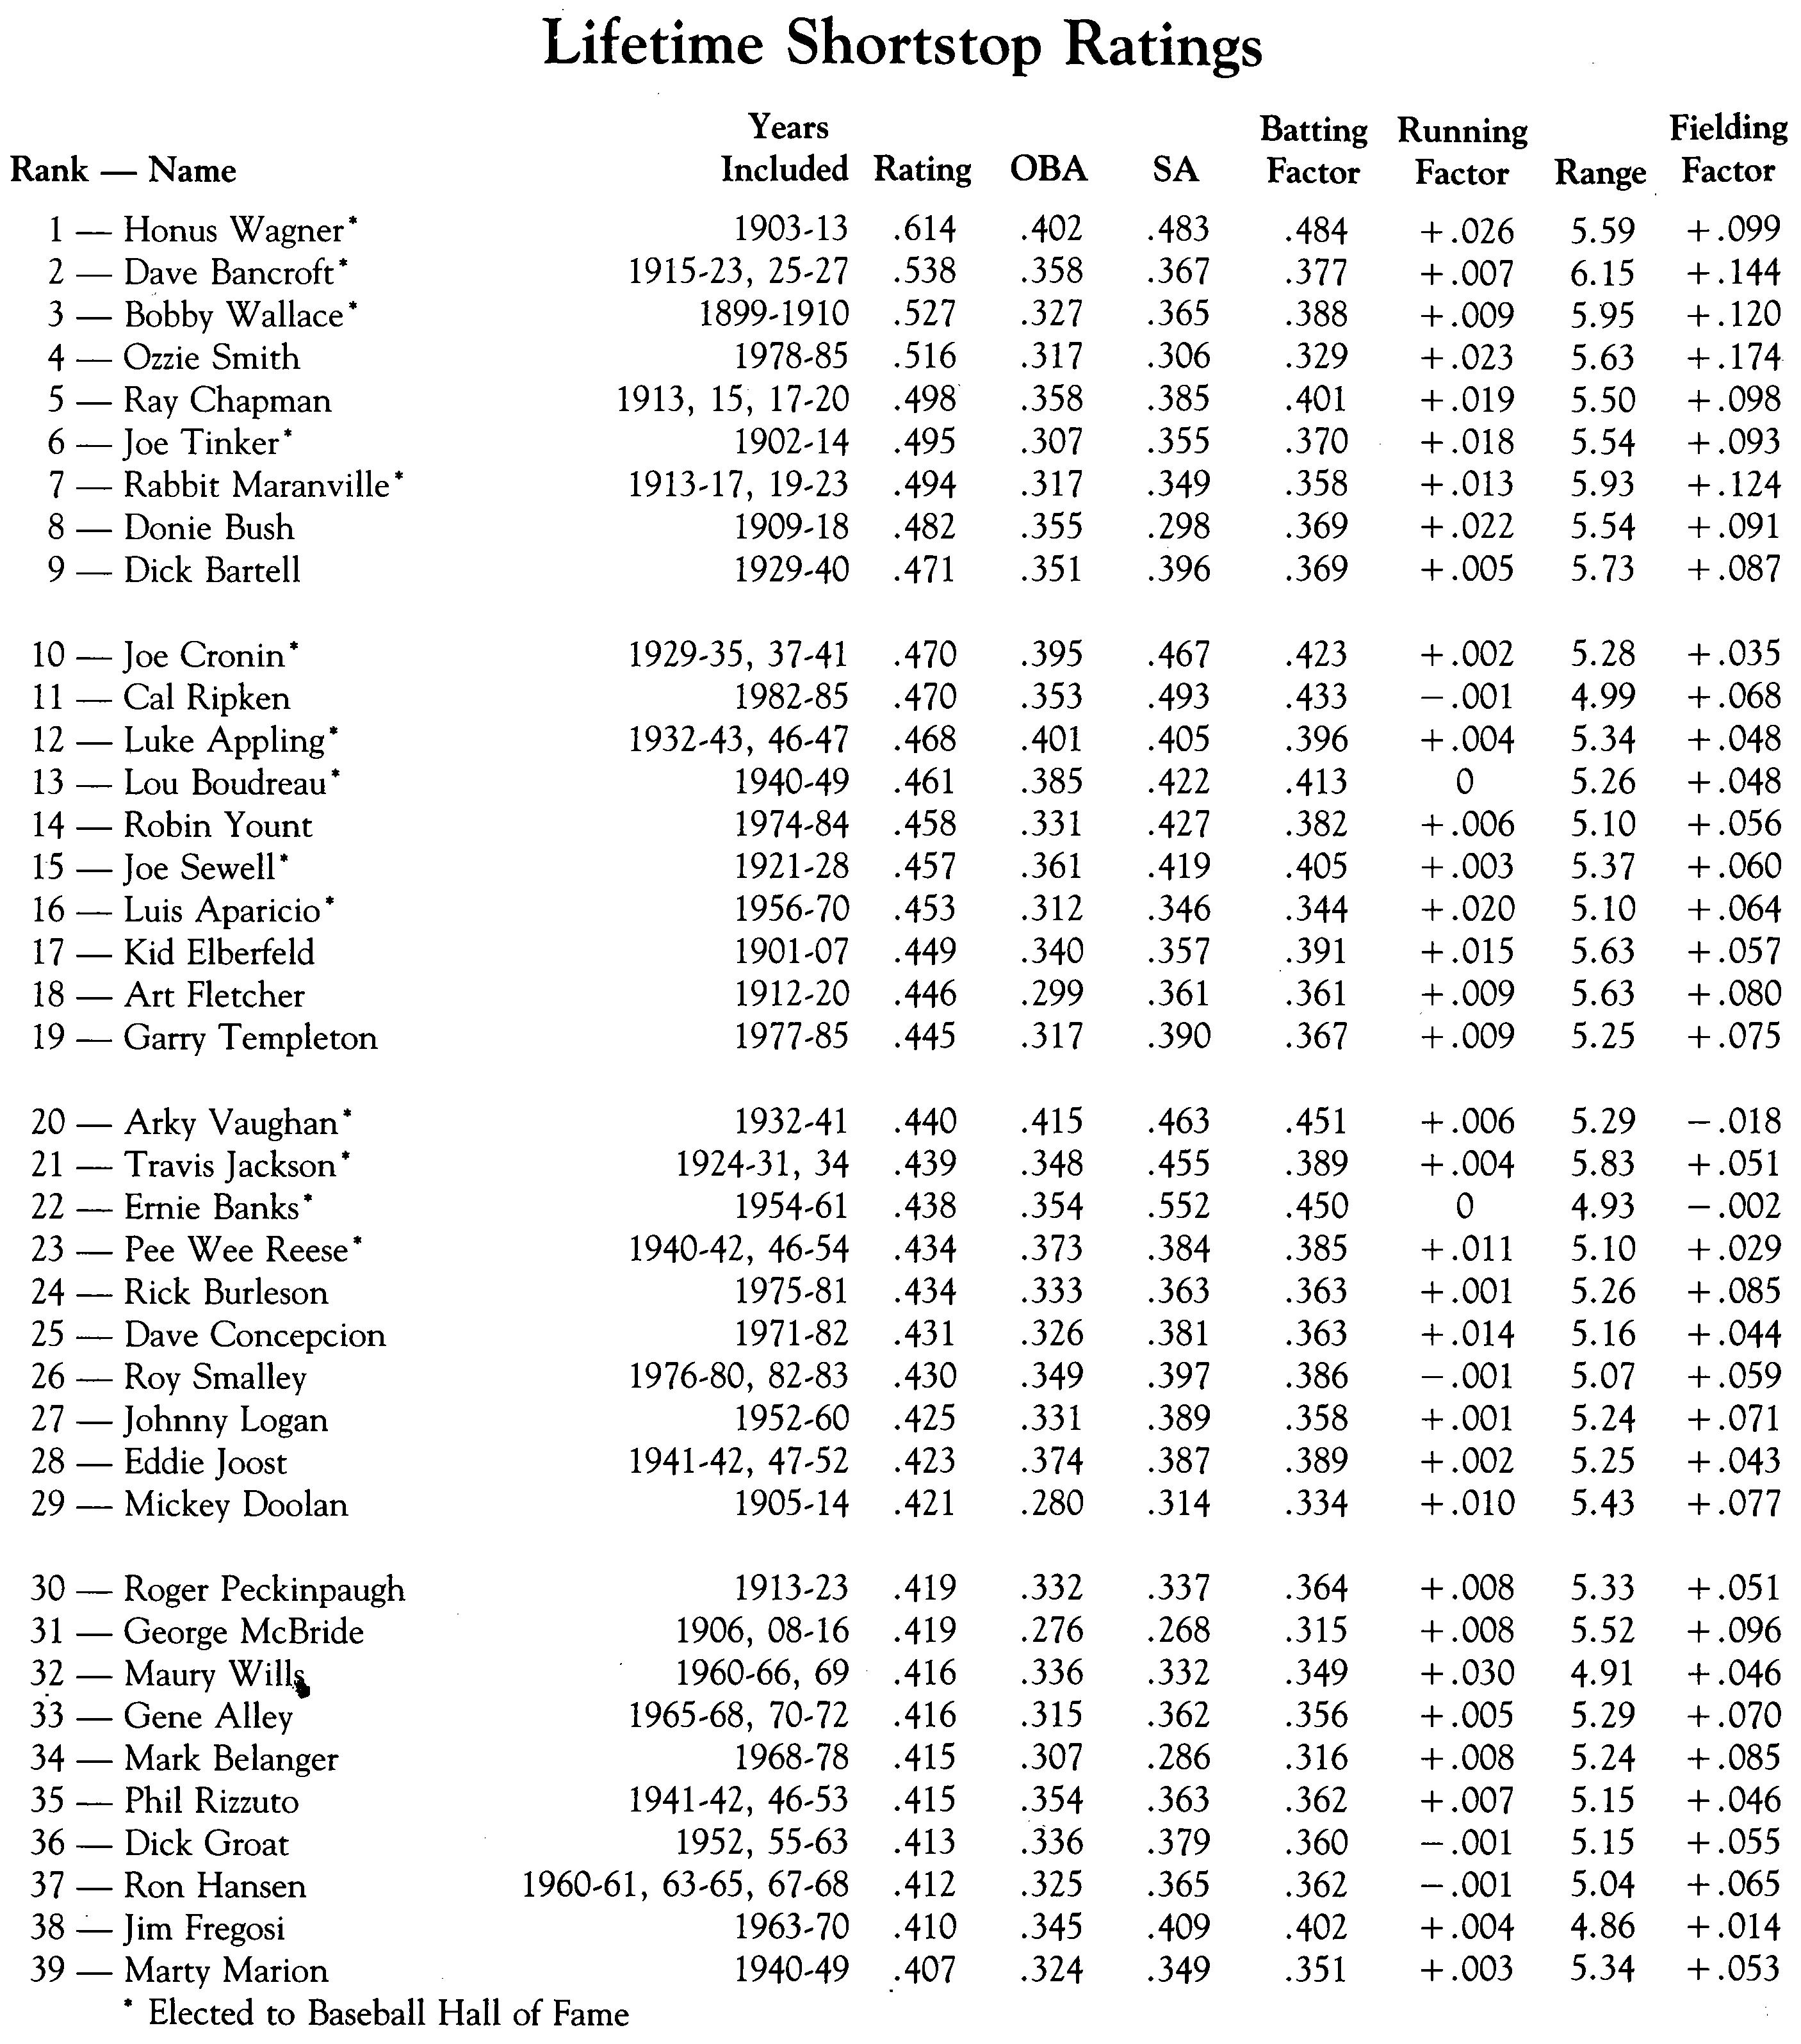 Lifetime Shortstop Ratings (DAVID S. NEFT)